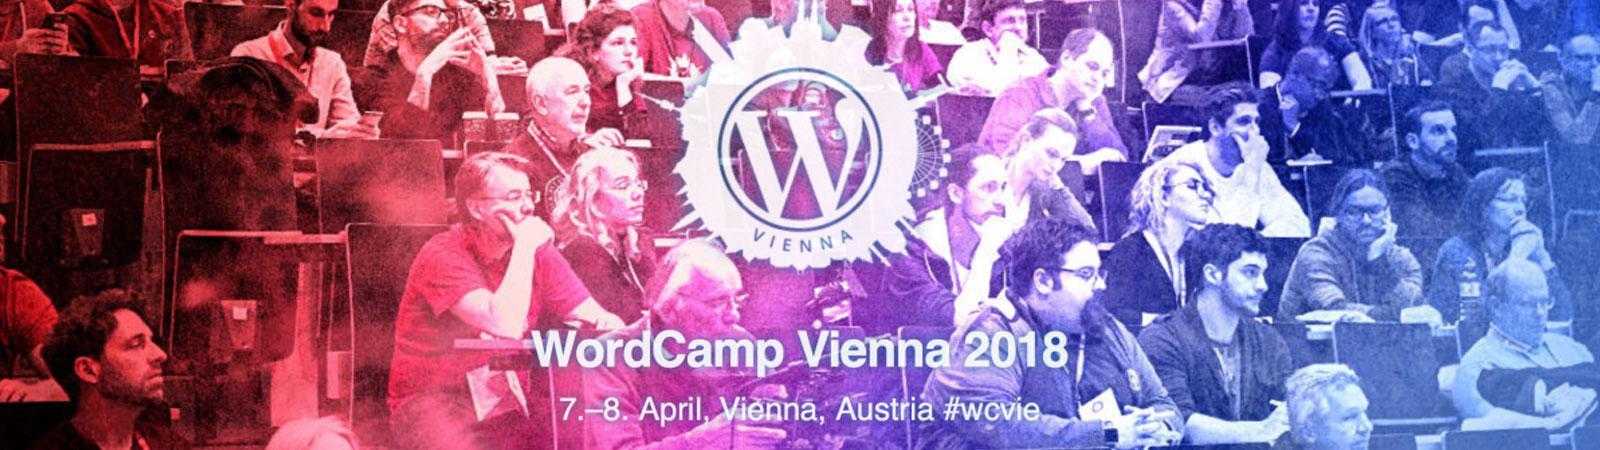 [ Blog ] WordCamp